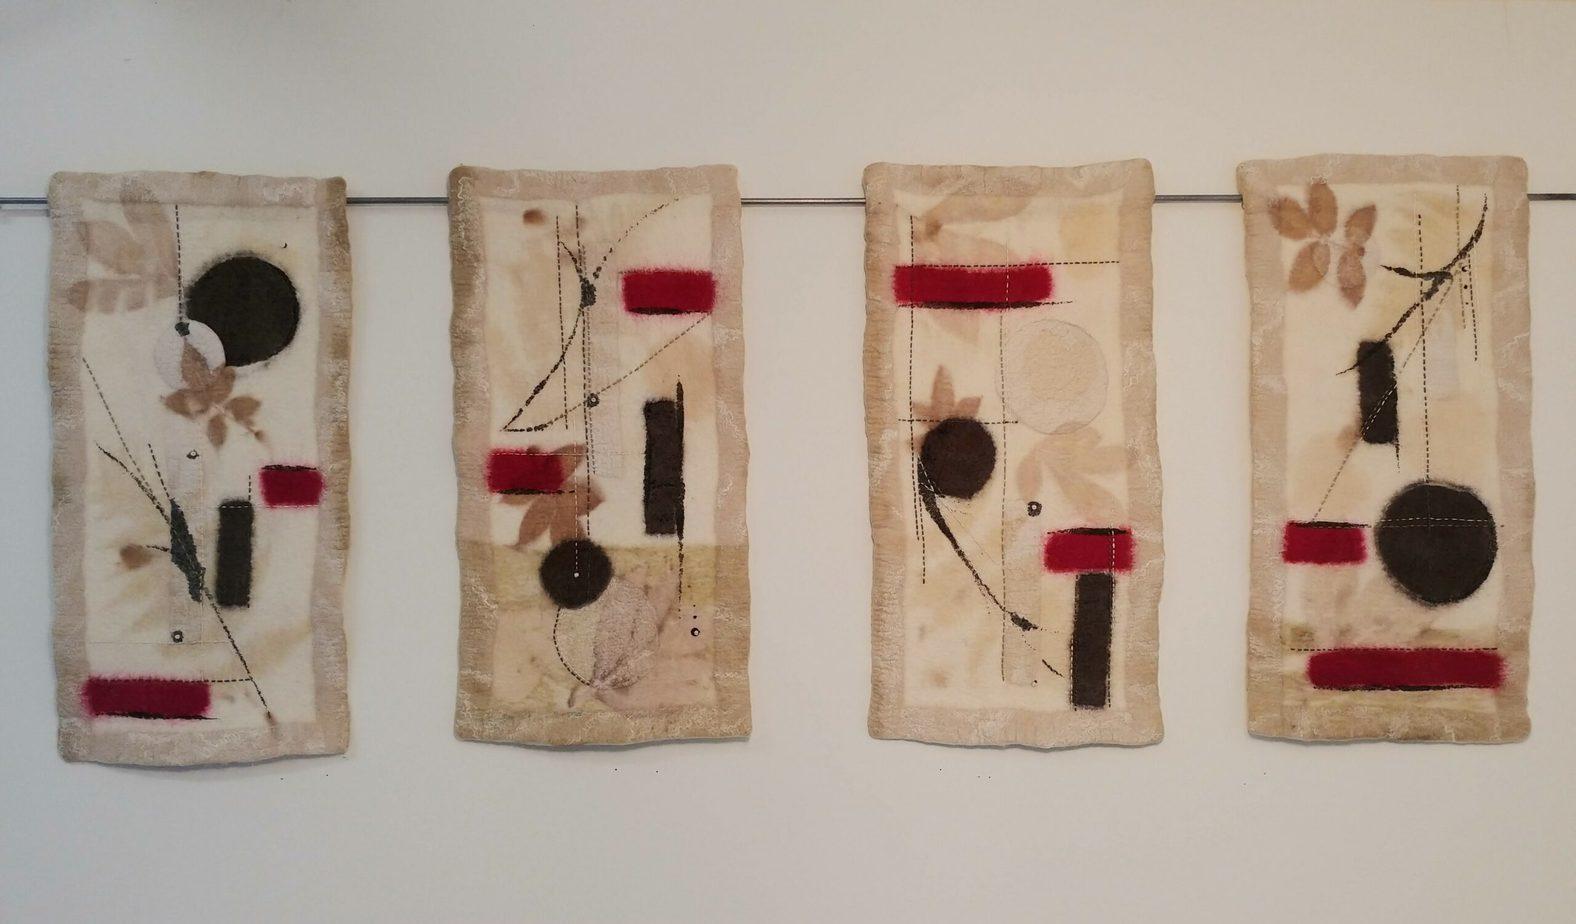 4-panel-wall-hanging